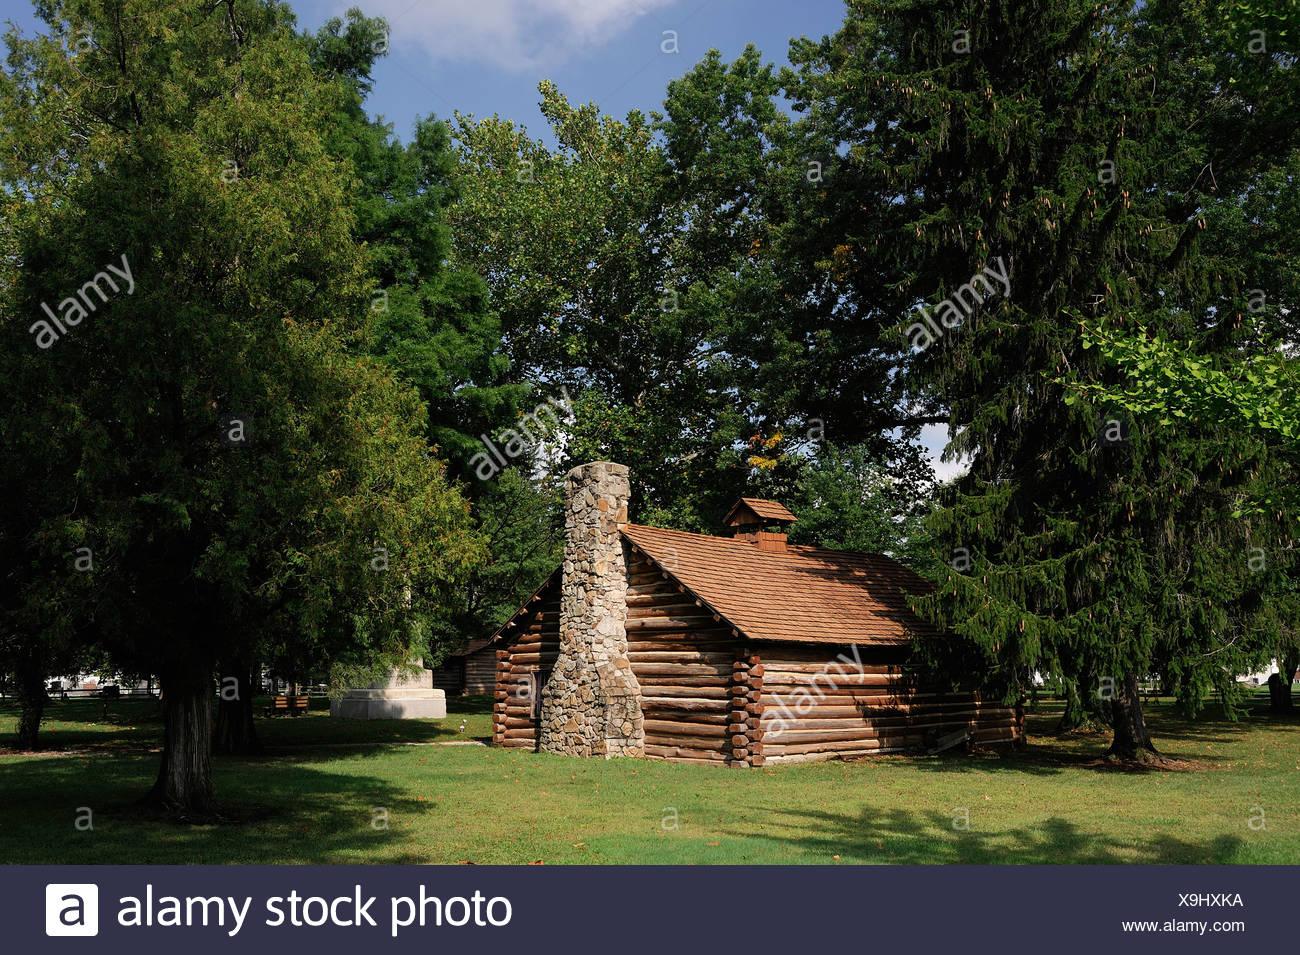 Cabin log house The Gnadenhutten Massacre Site Gnadenhutten Ohio USA America United States of America tree - Stock Image